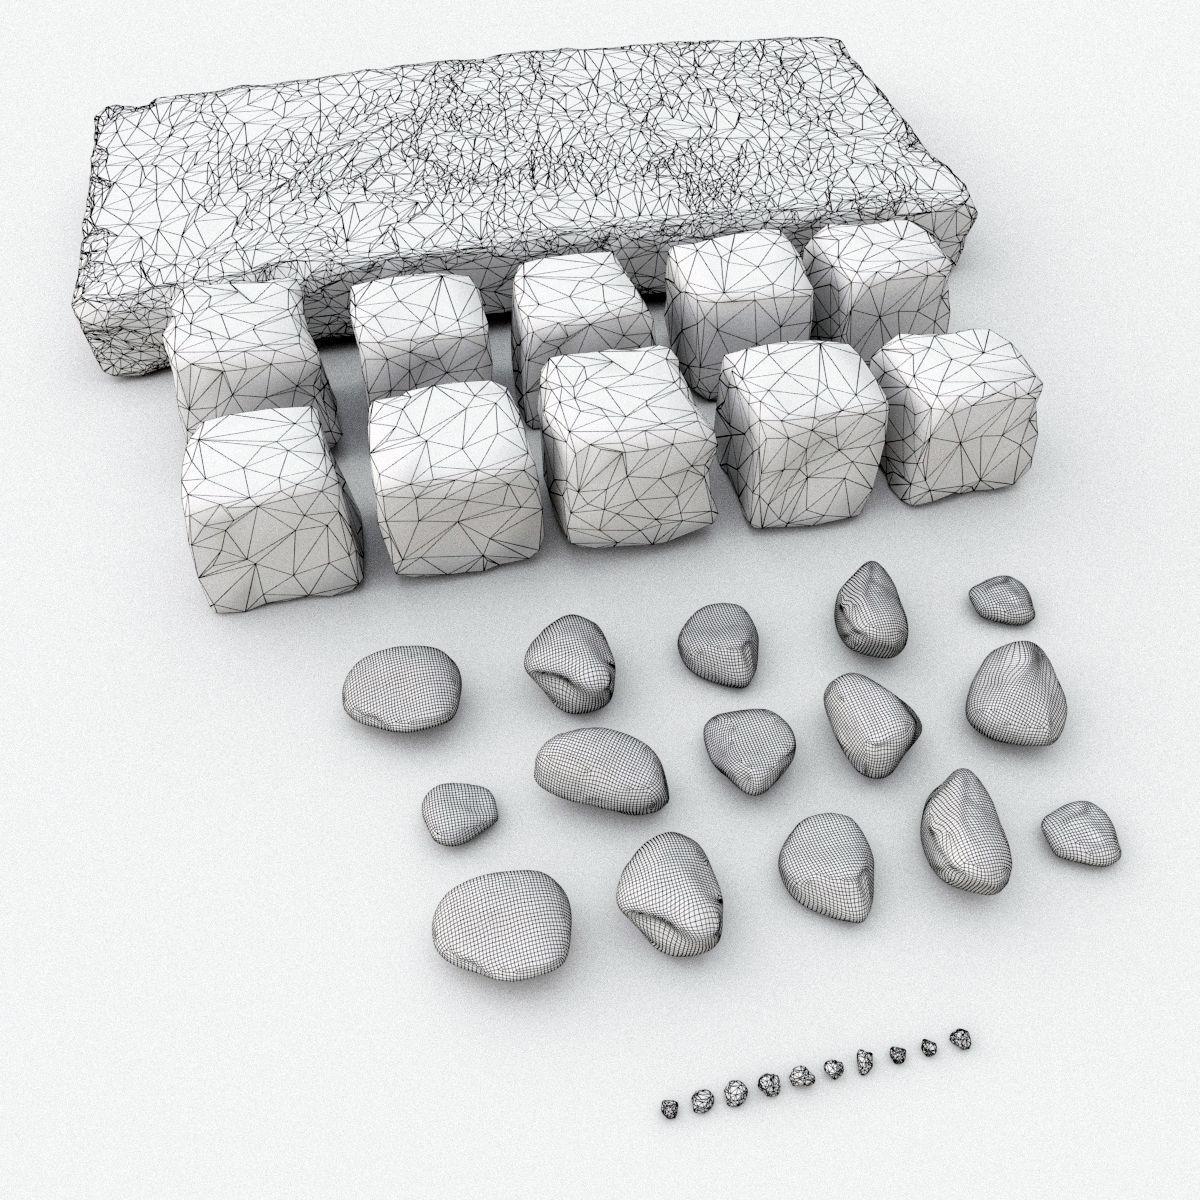 Stone set 3D Model MAX OBJ FBX MTL MAT | CGTrader.com on Granite Models  id=49682